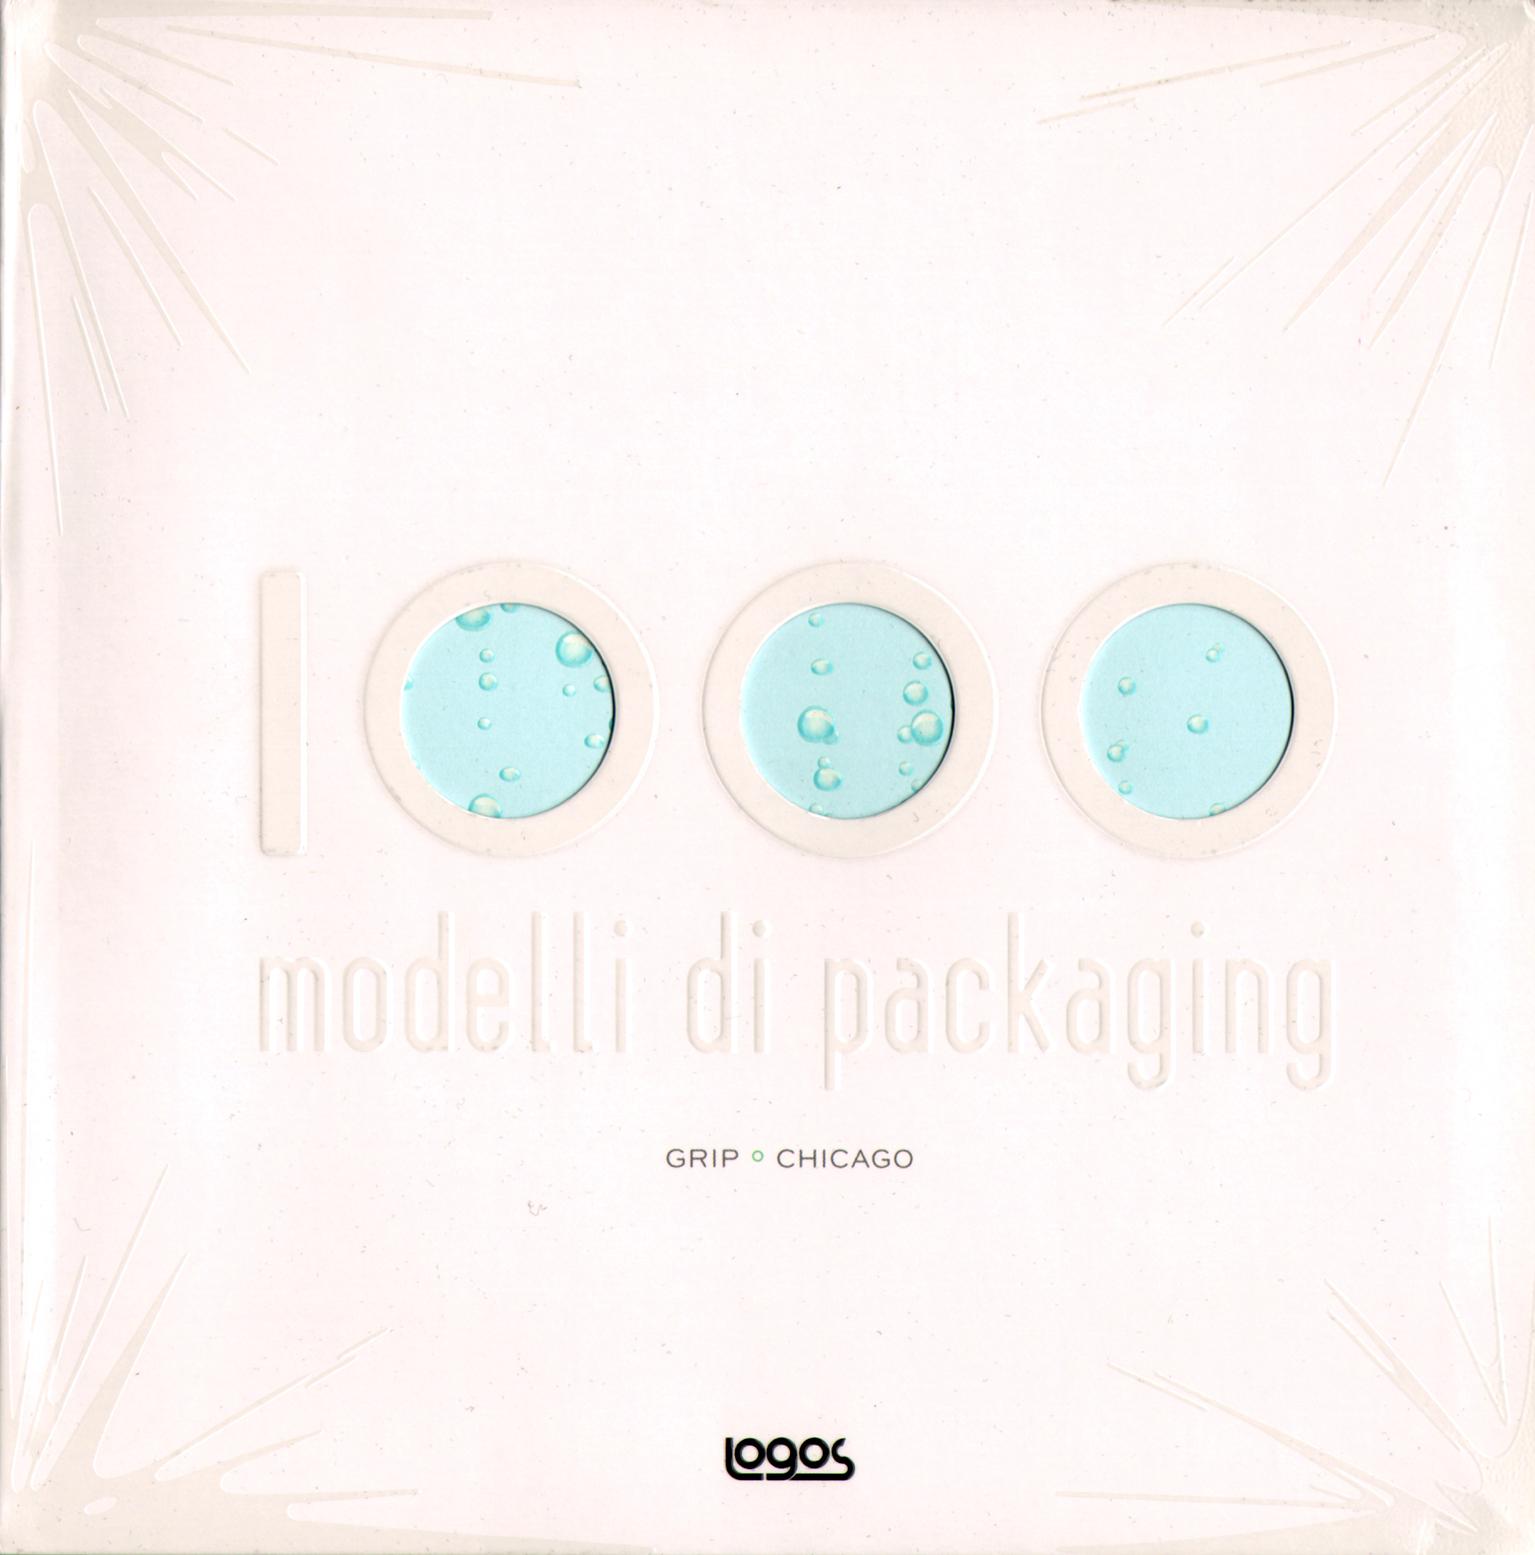 1000 modelli di packaging